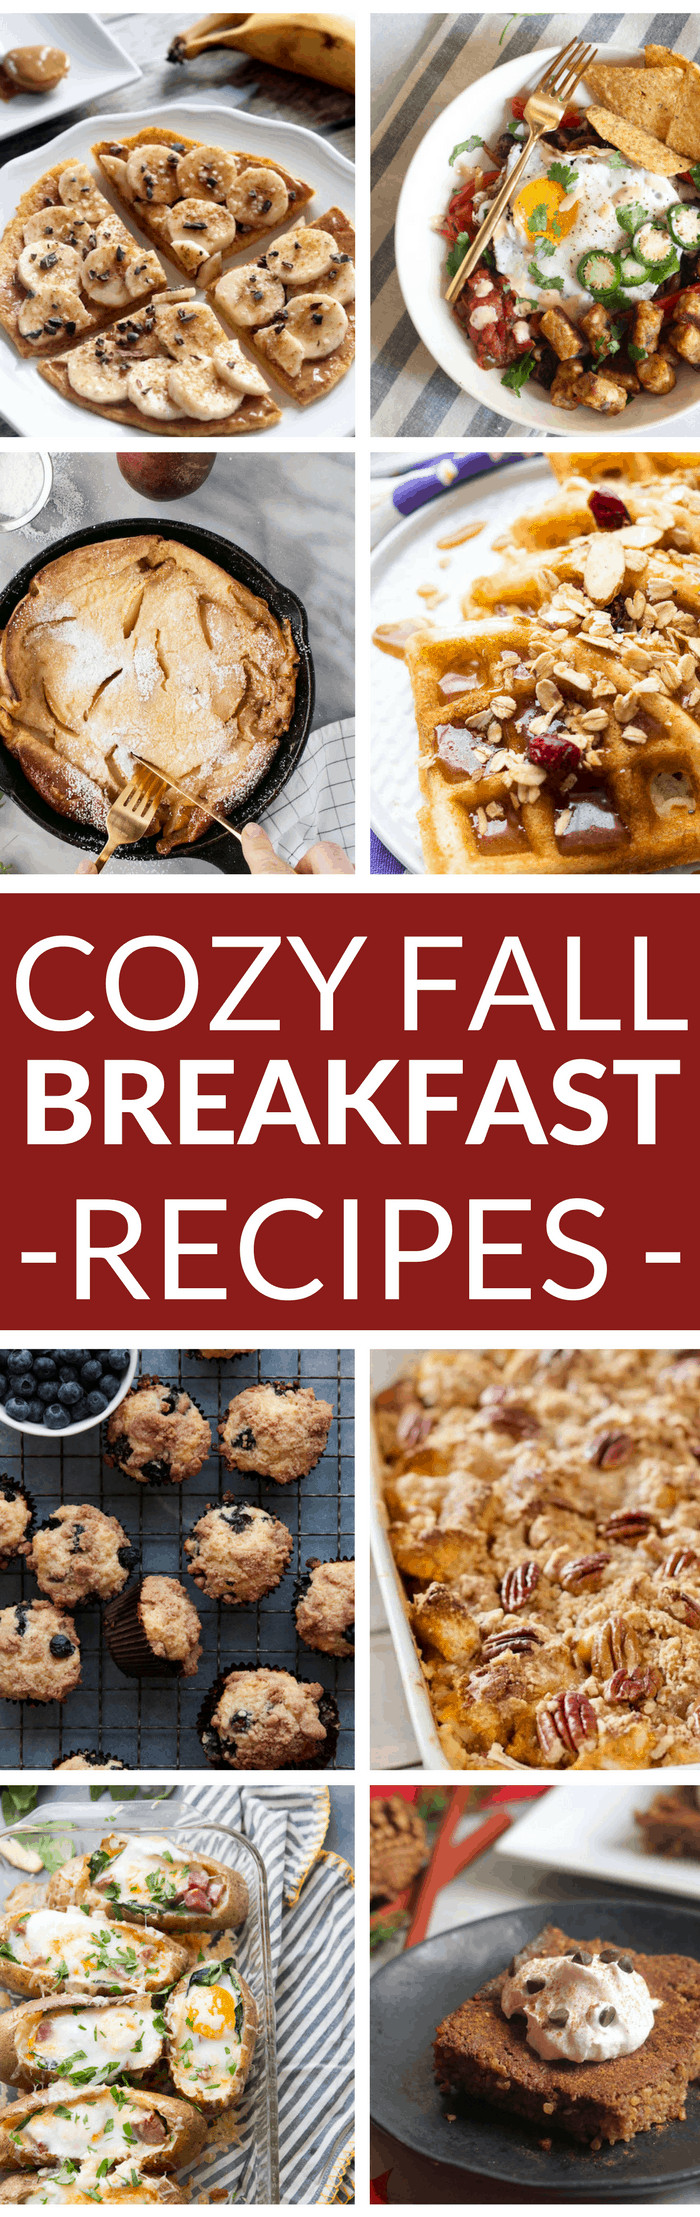 Fall Breakfast Recipes  25 Cozy Fall Breakfast Recipes Hummusapien